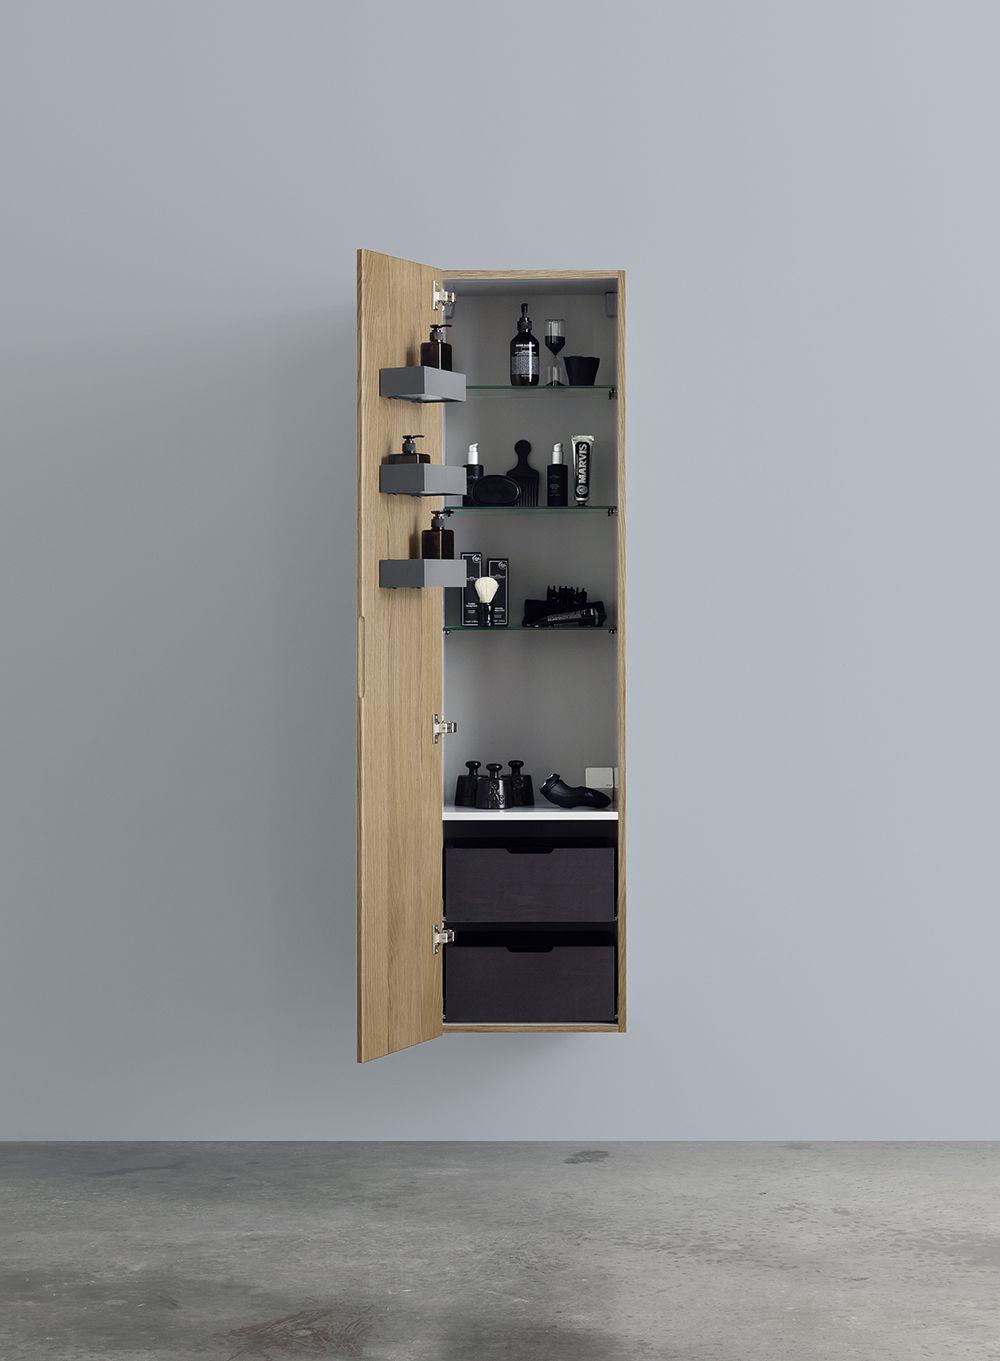 Aspen Badrum / Badrumsskåp / Bathroom Furniture / | Badrumsskåp ...